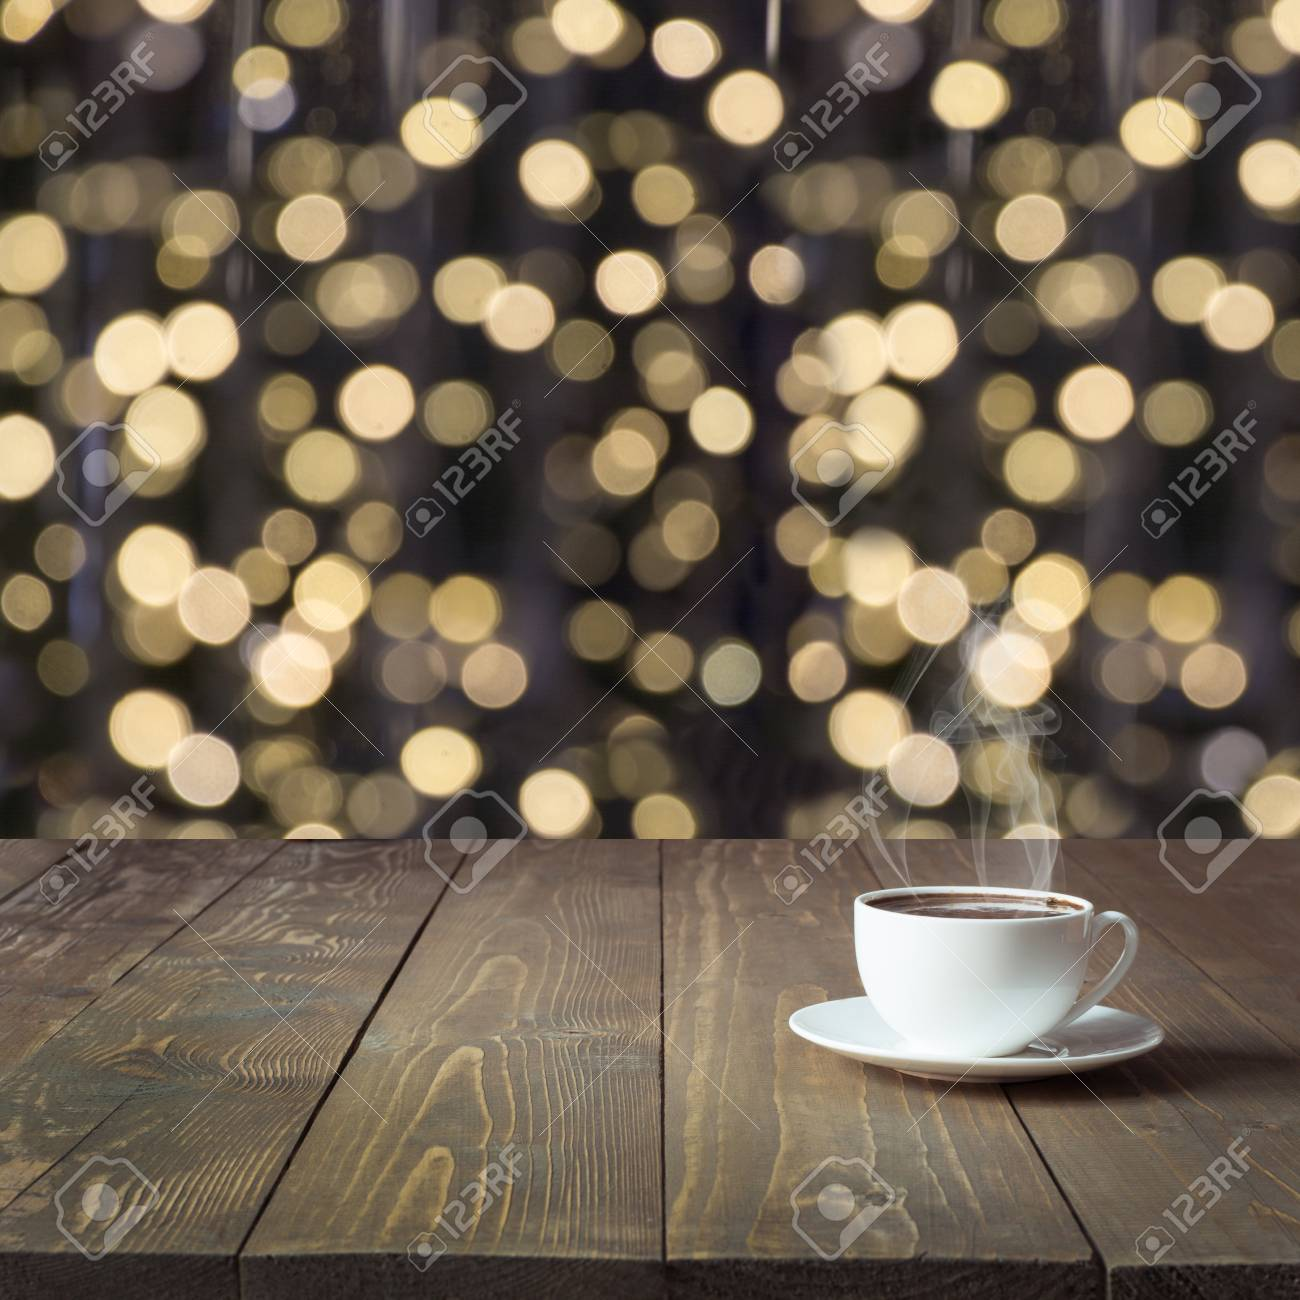 Randki cafe paypal